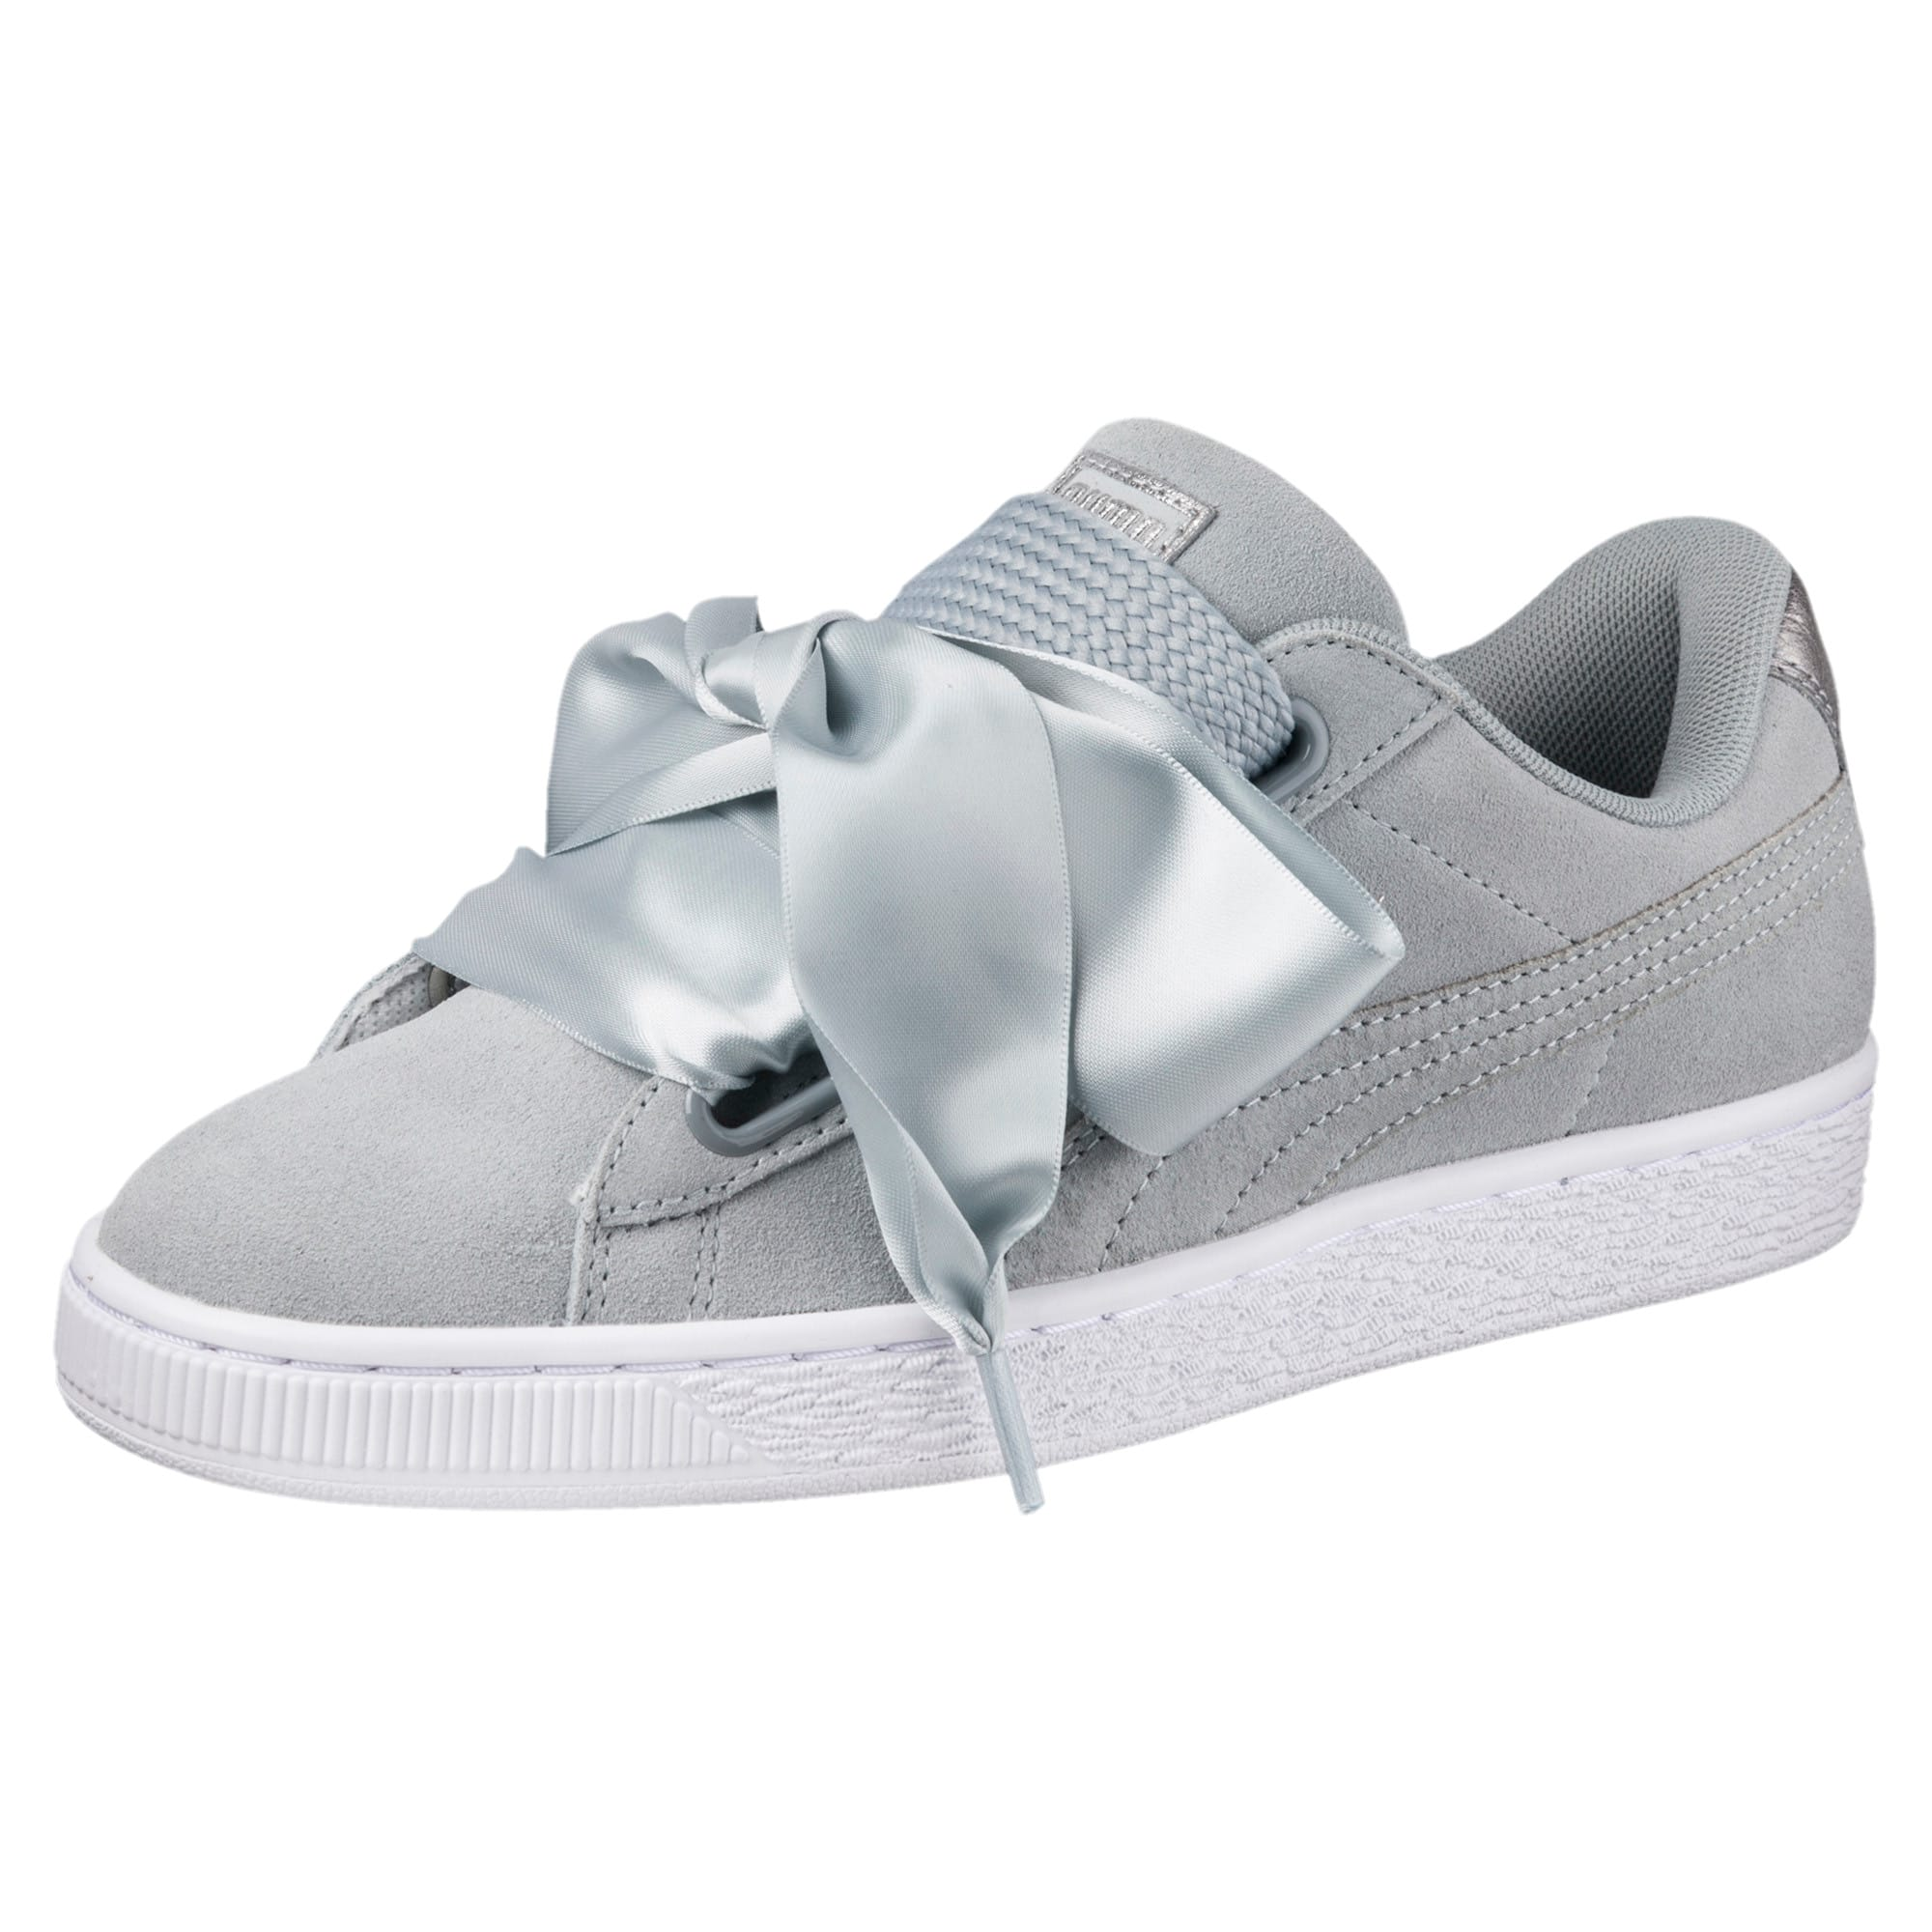 PUMA BASKET SUEDE Heart Metallic Safari White Women's Shoes 364083 01 Size 9